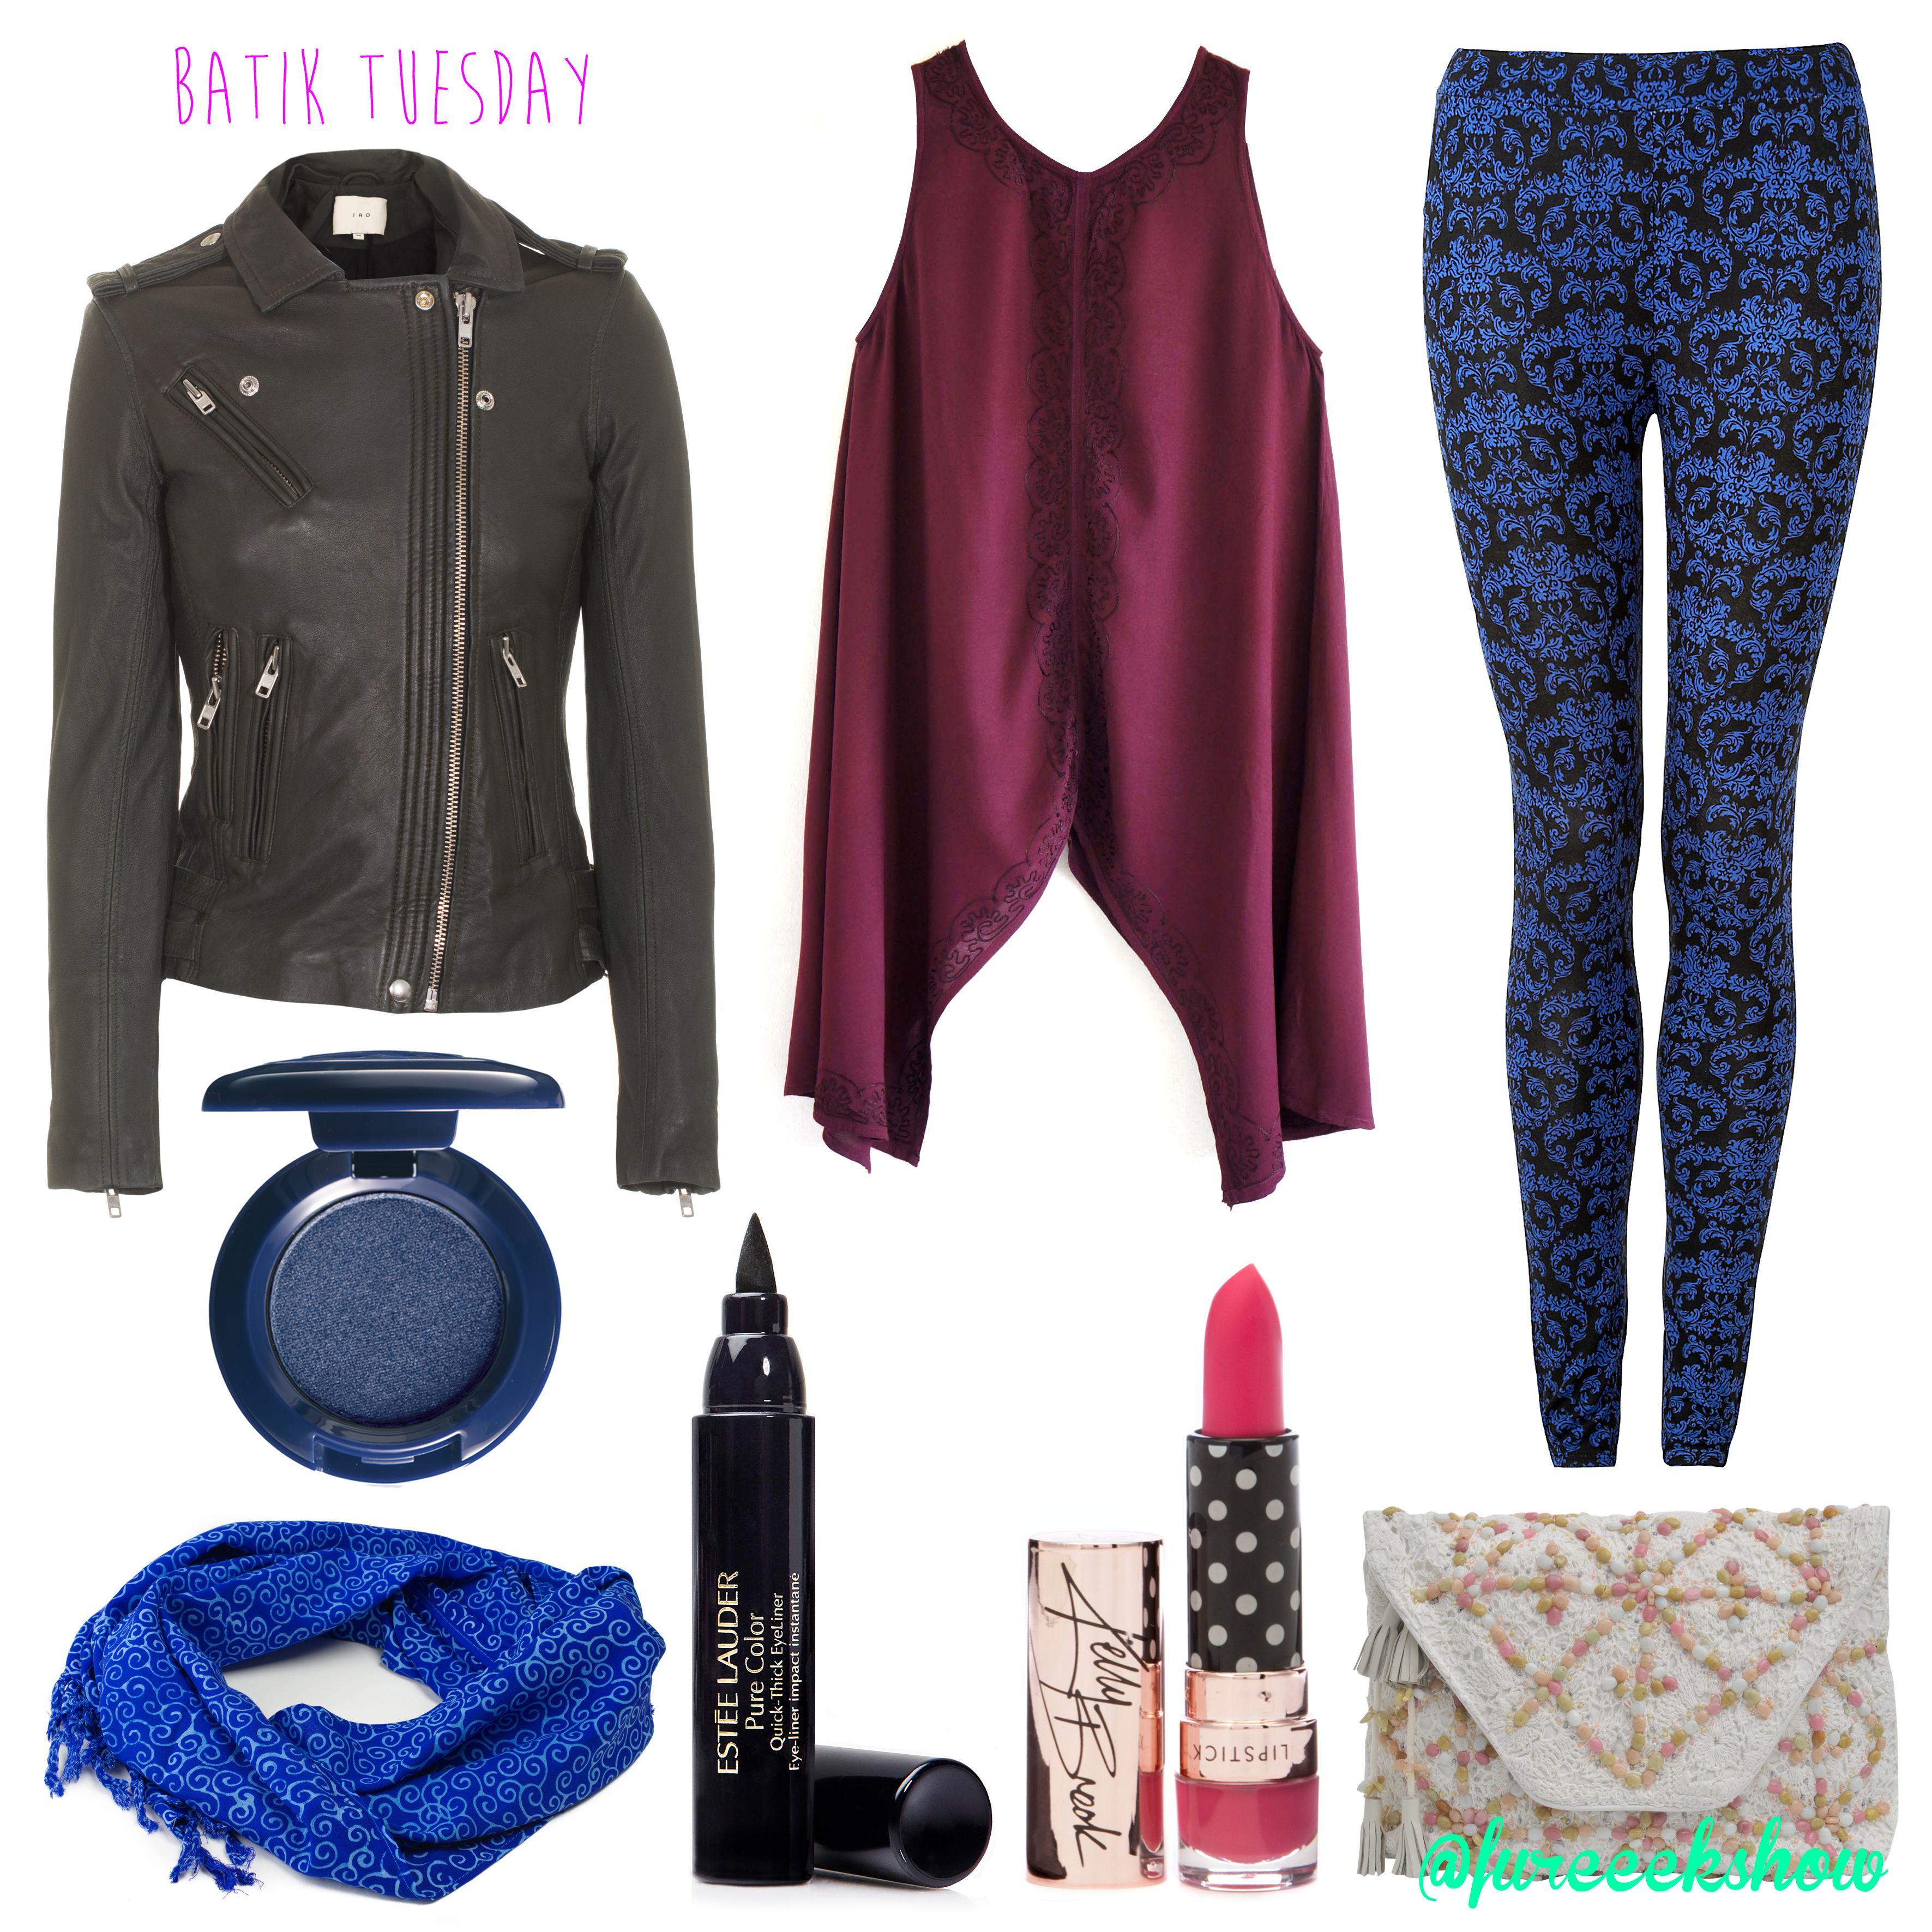 A modern twist on Batik!  #fureeekshow #fashion #batik  *Image credit: Google*